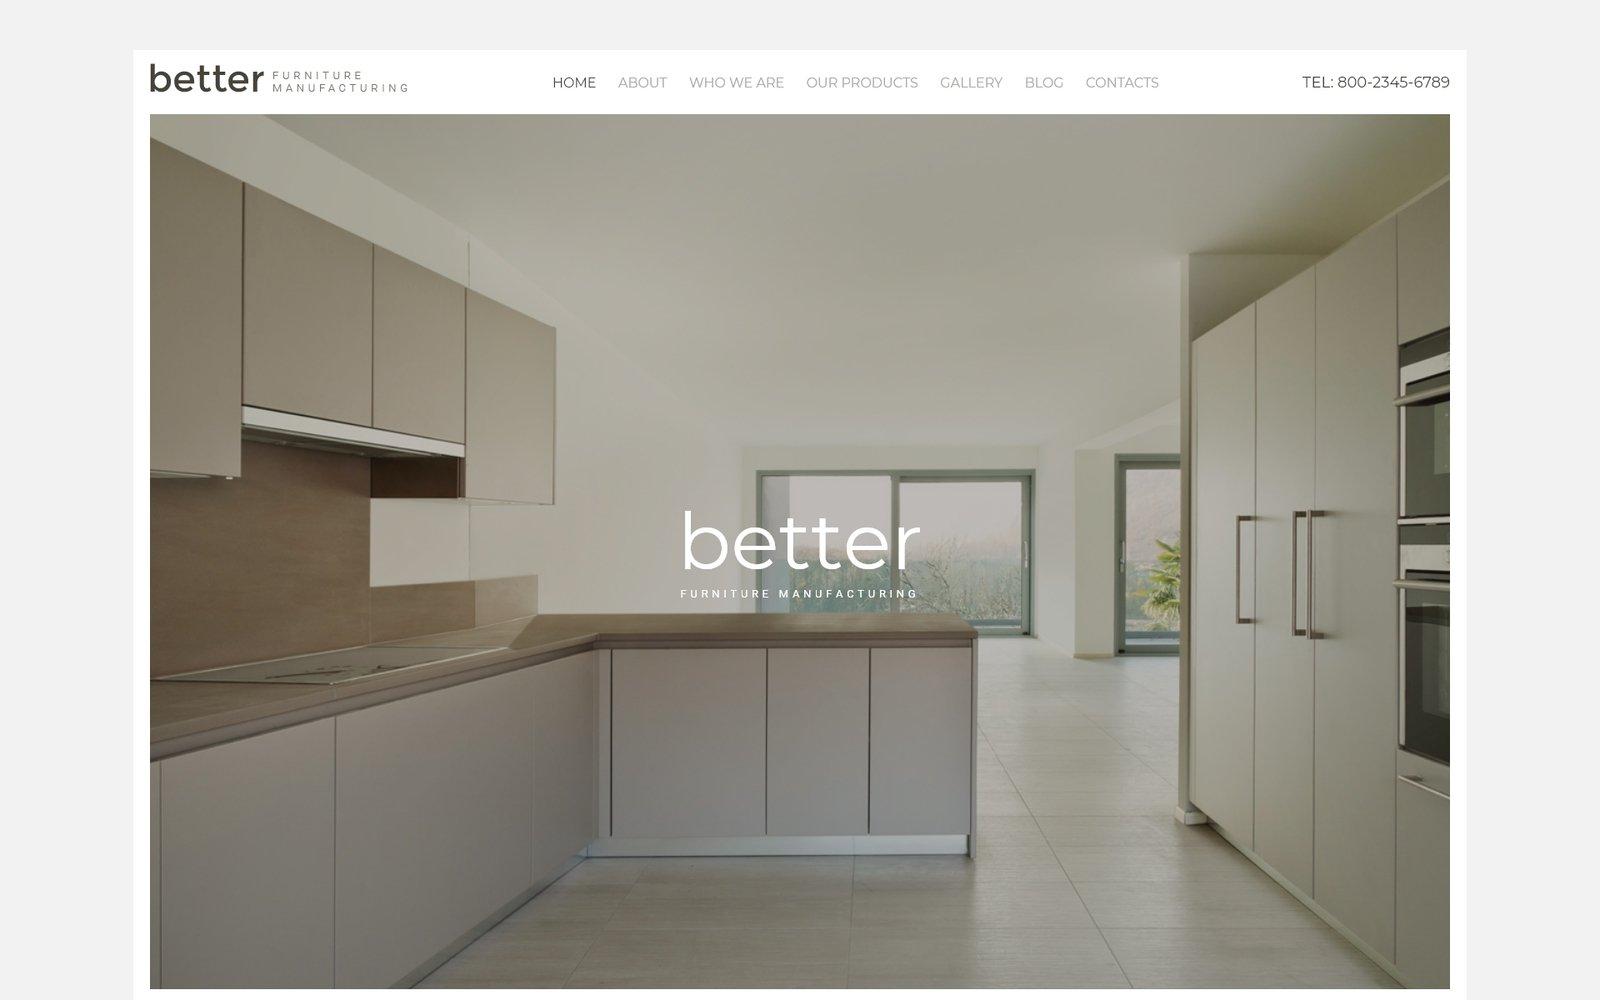 Better Furniture Manufacturing Website Template - screenshot